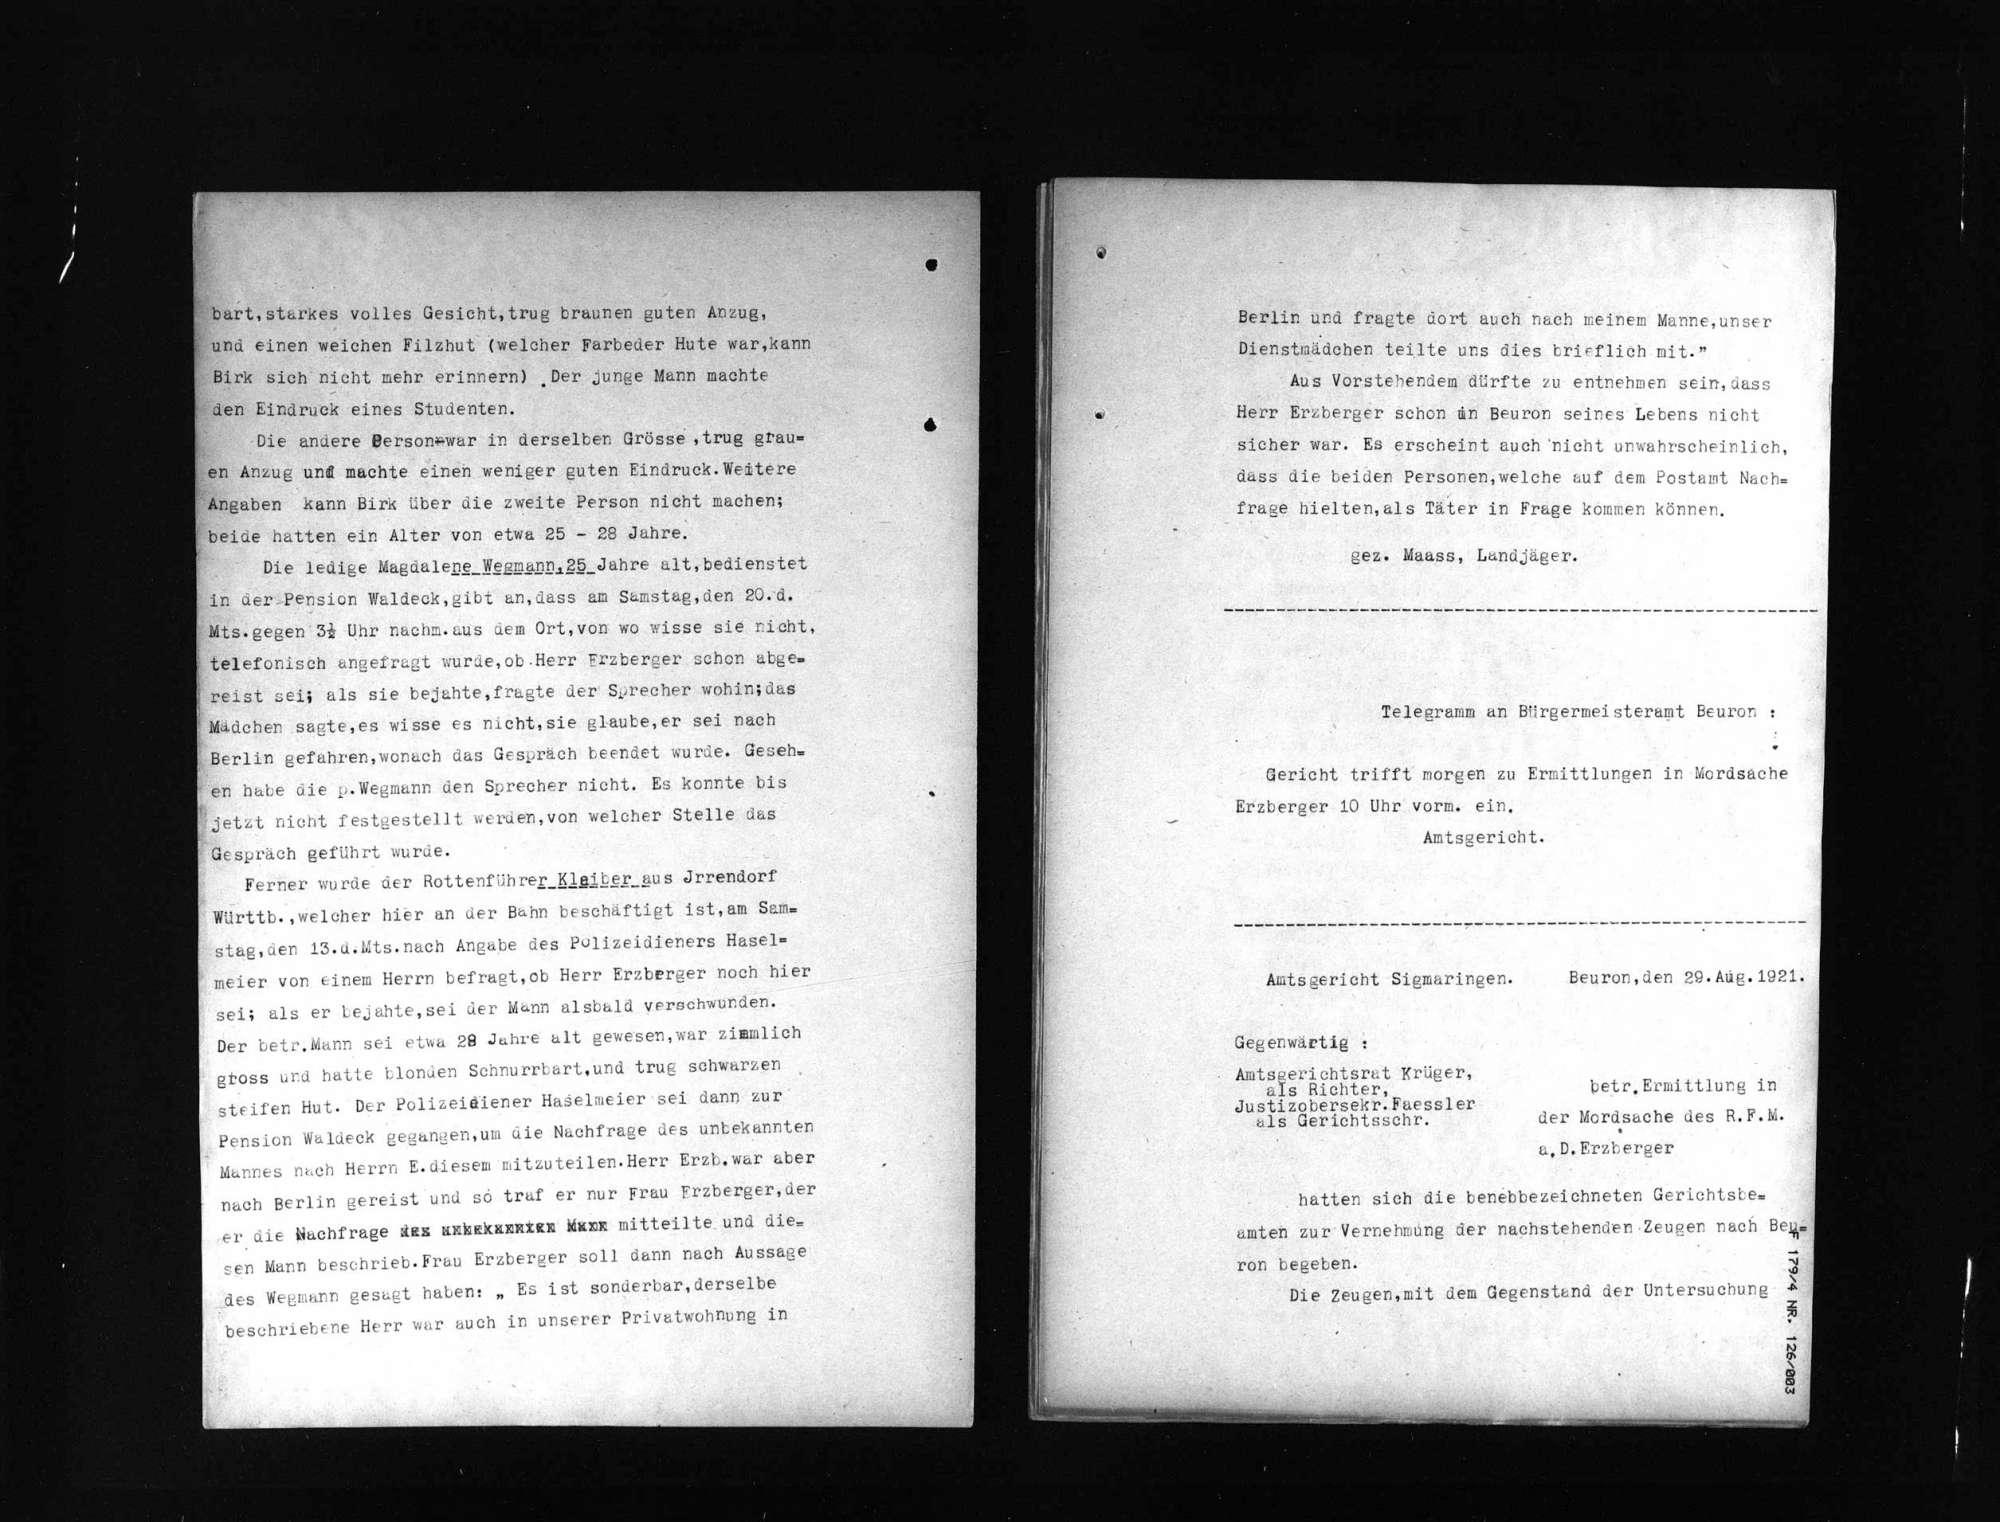 Untersuchungsakten -Sonderheft Beuron (beglaubigte Abschrift), Bild 3